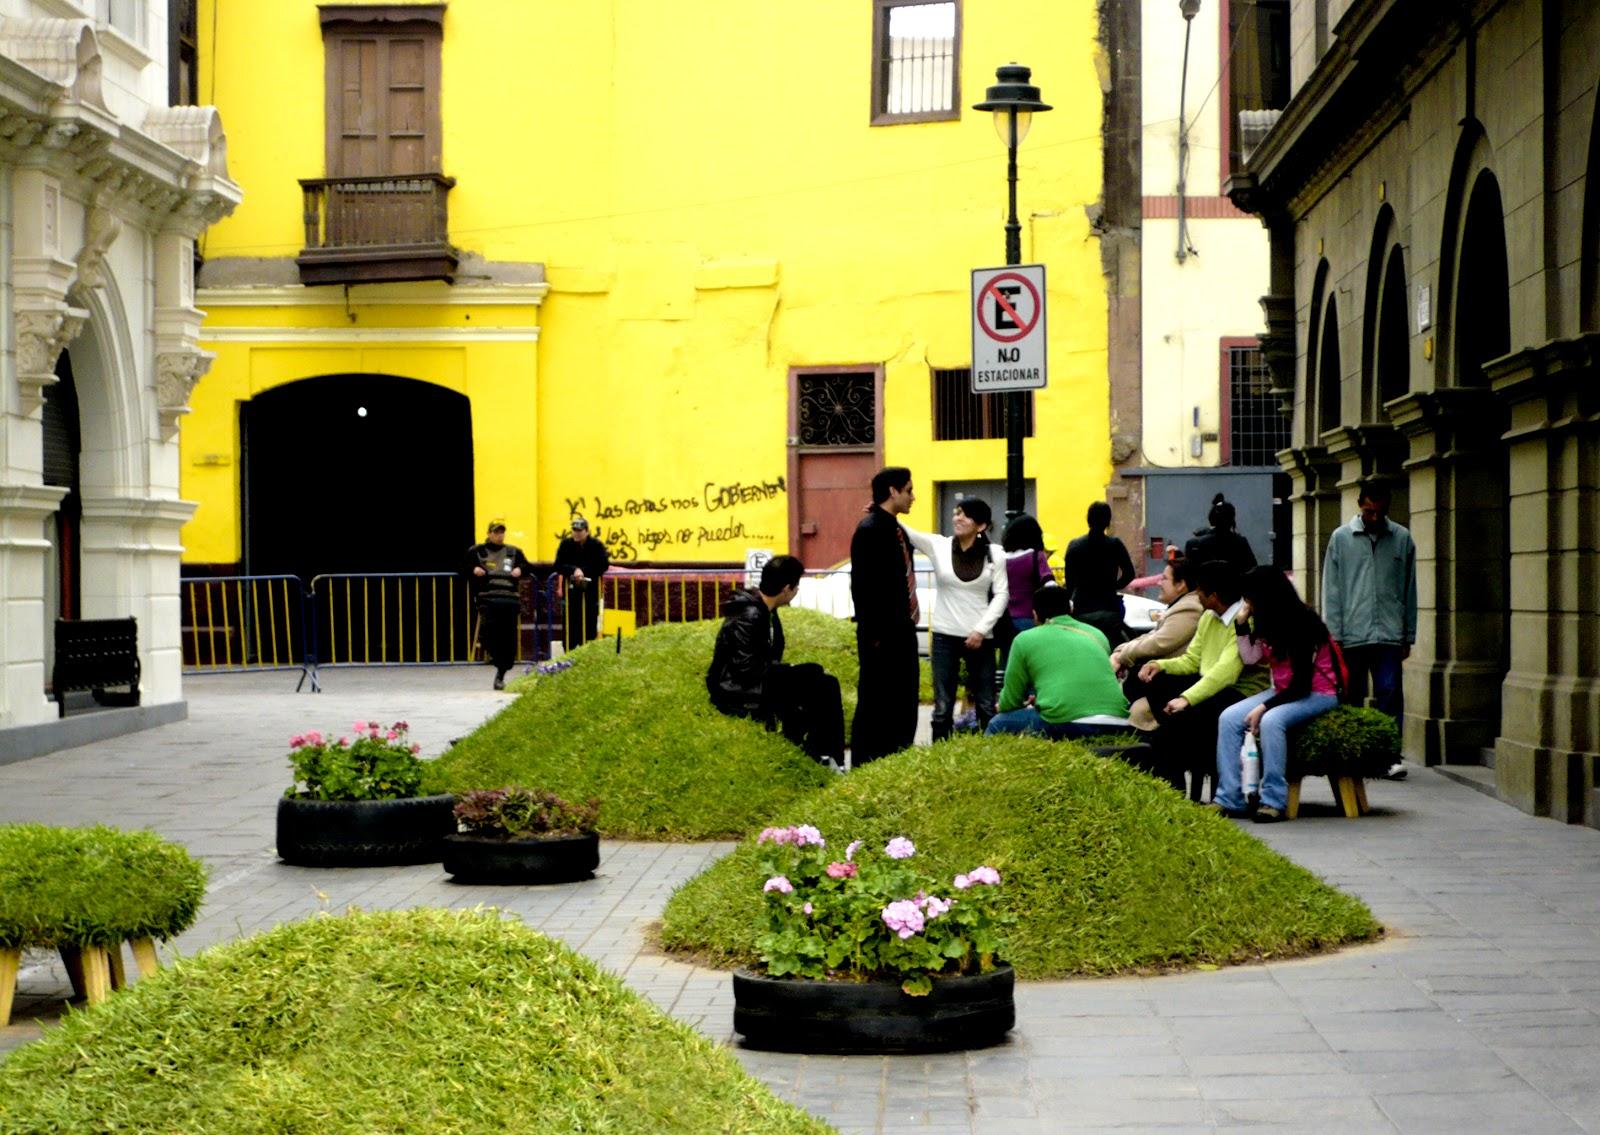 http://4.bp.blogspot.com/-hQycklyKgRw/UIaHhF3KuAI/AAAAAAAAH4g/rkdI6_crop4/s1600/invasion+verde+2.jpg